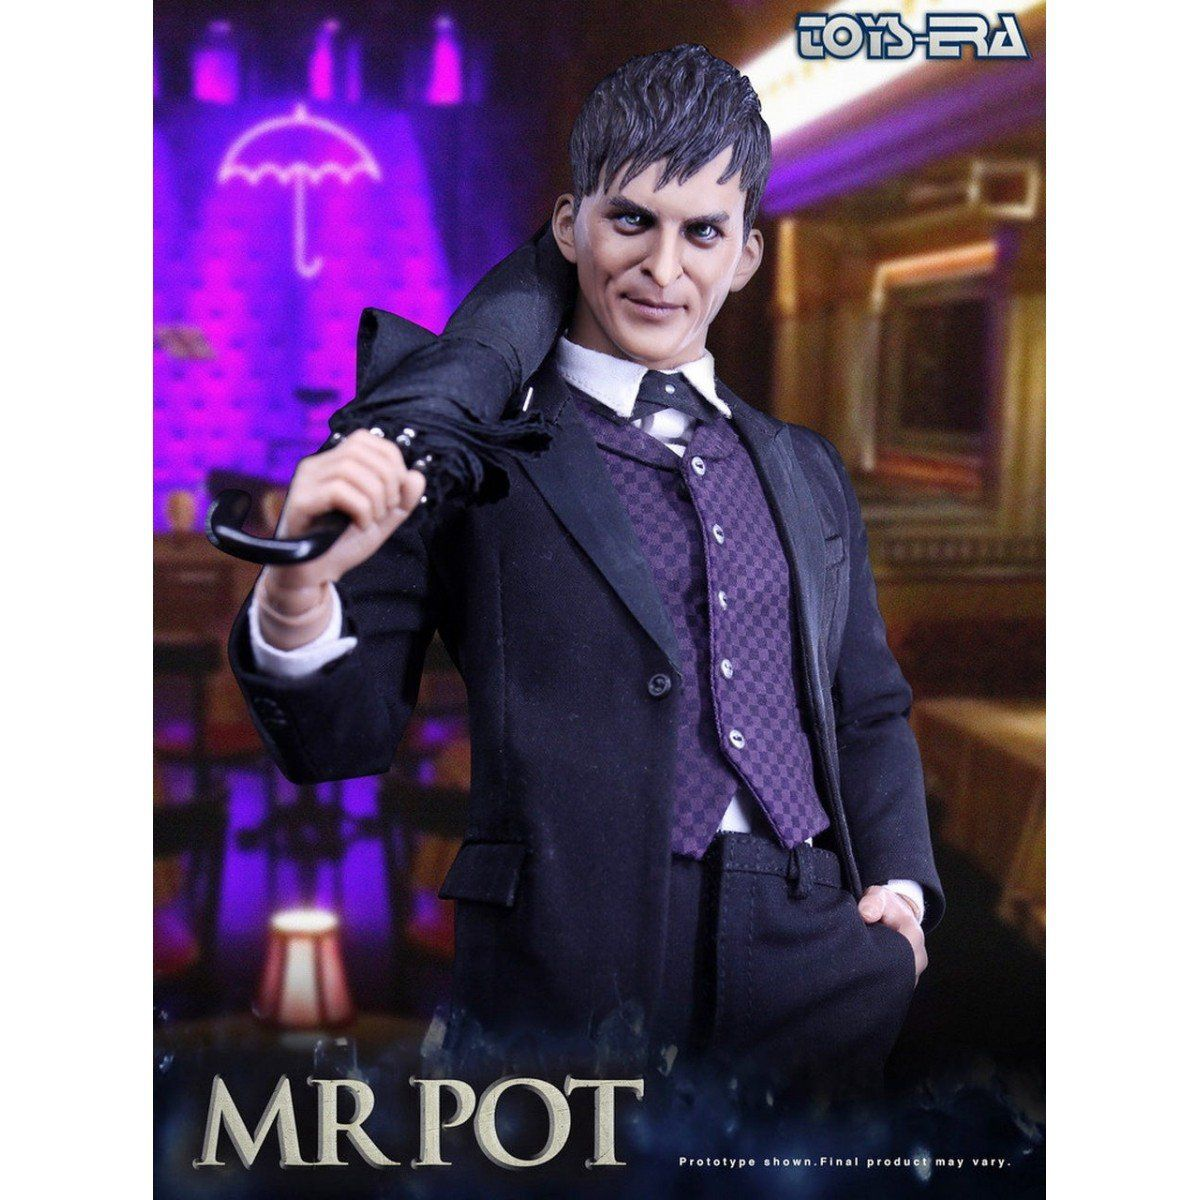 PRÉ VENDA: Boneco Pinguim (The Mr Pot / Oswald Cobblepot / Penguin): Batman Escala 1/6 - Toys Era